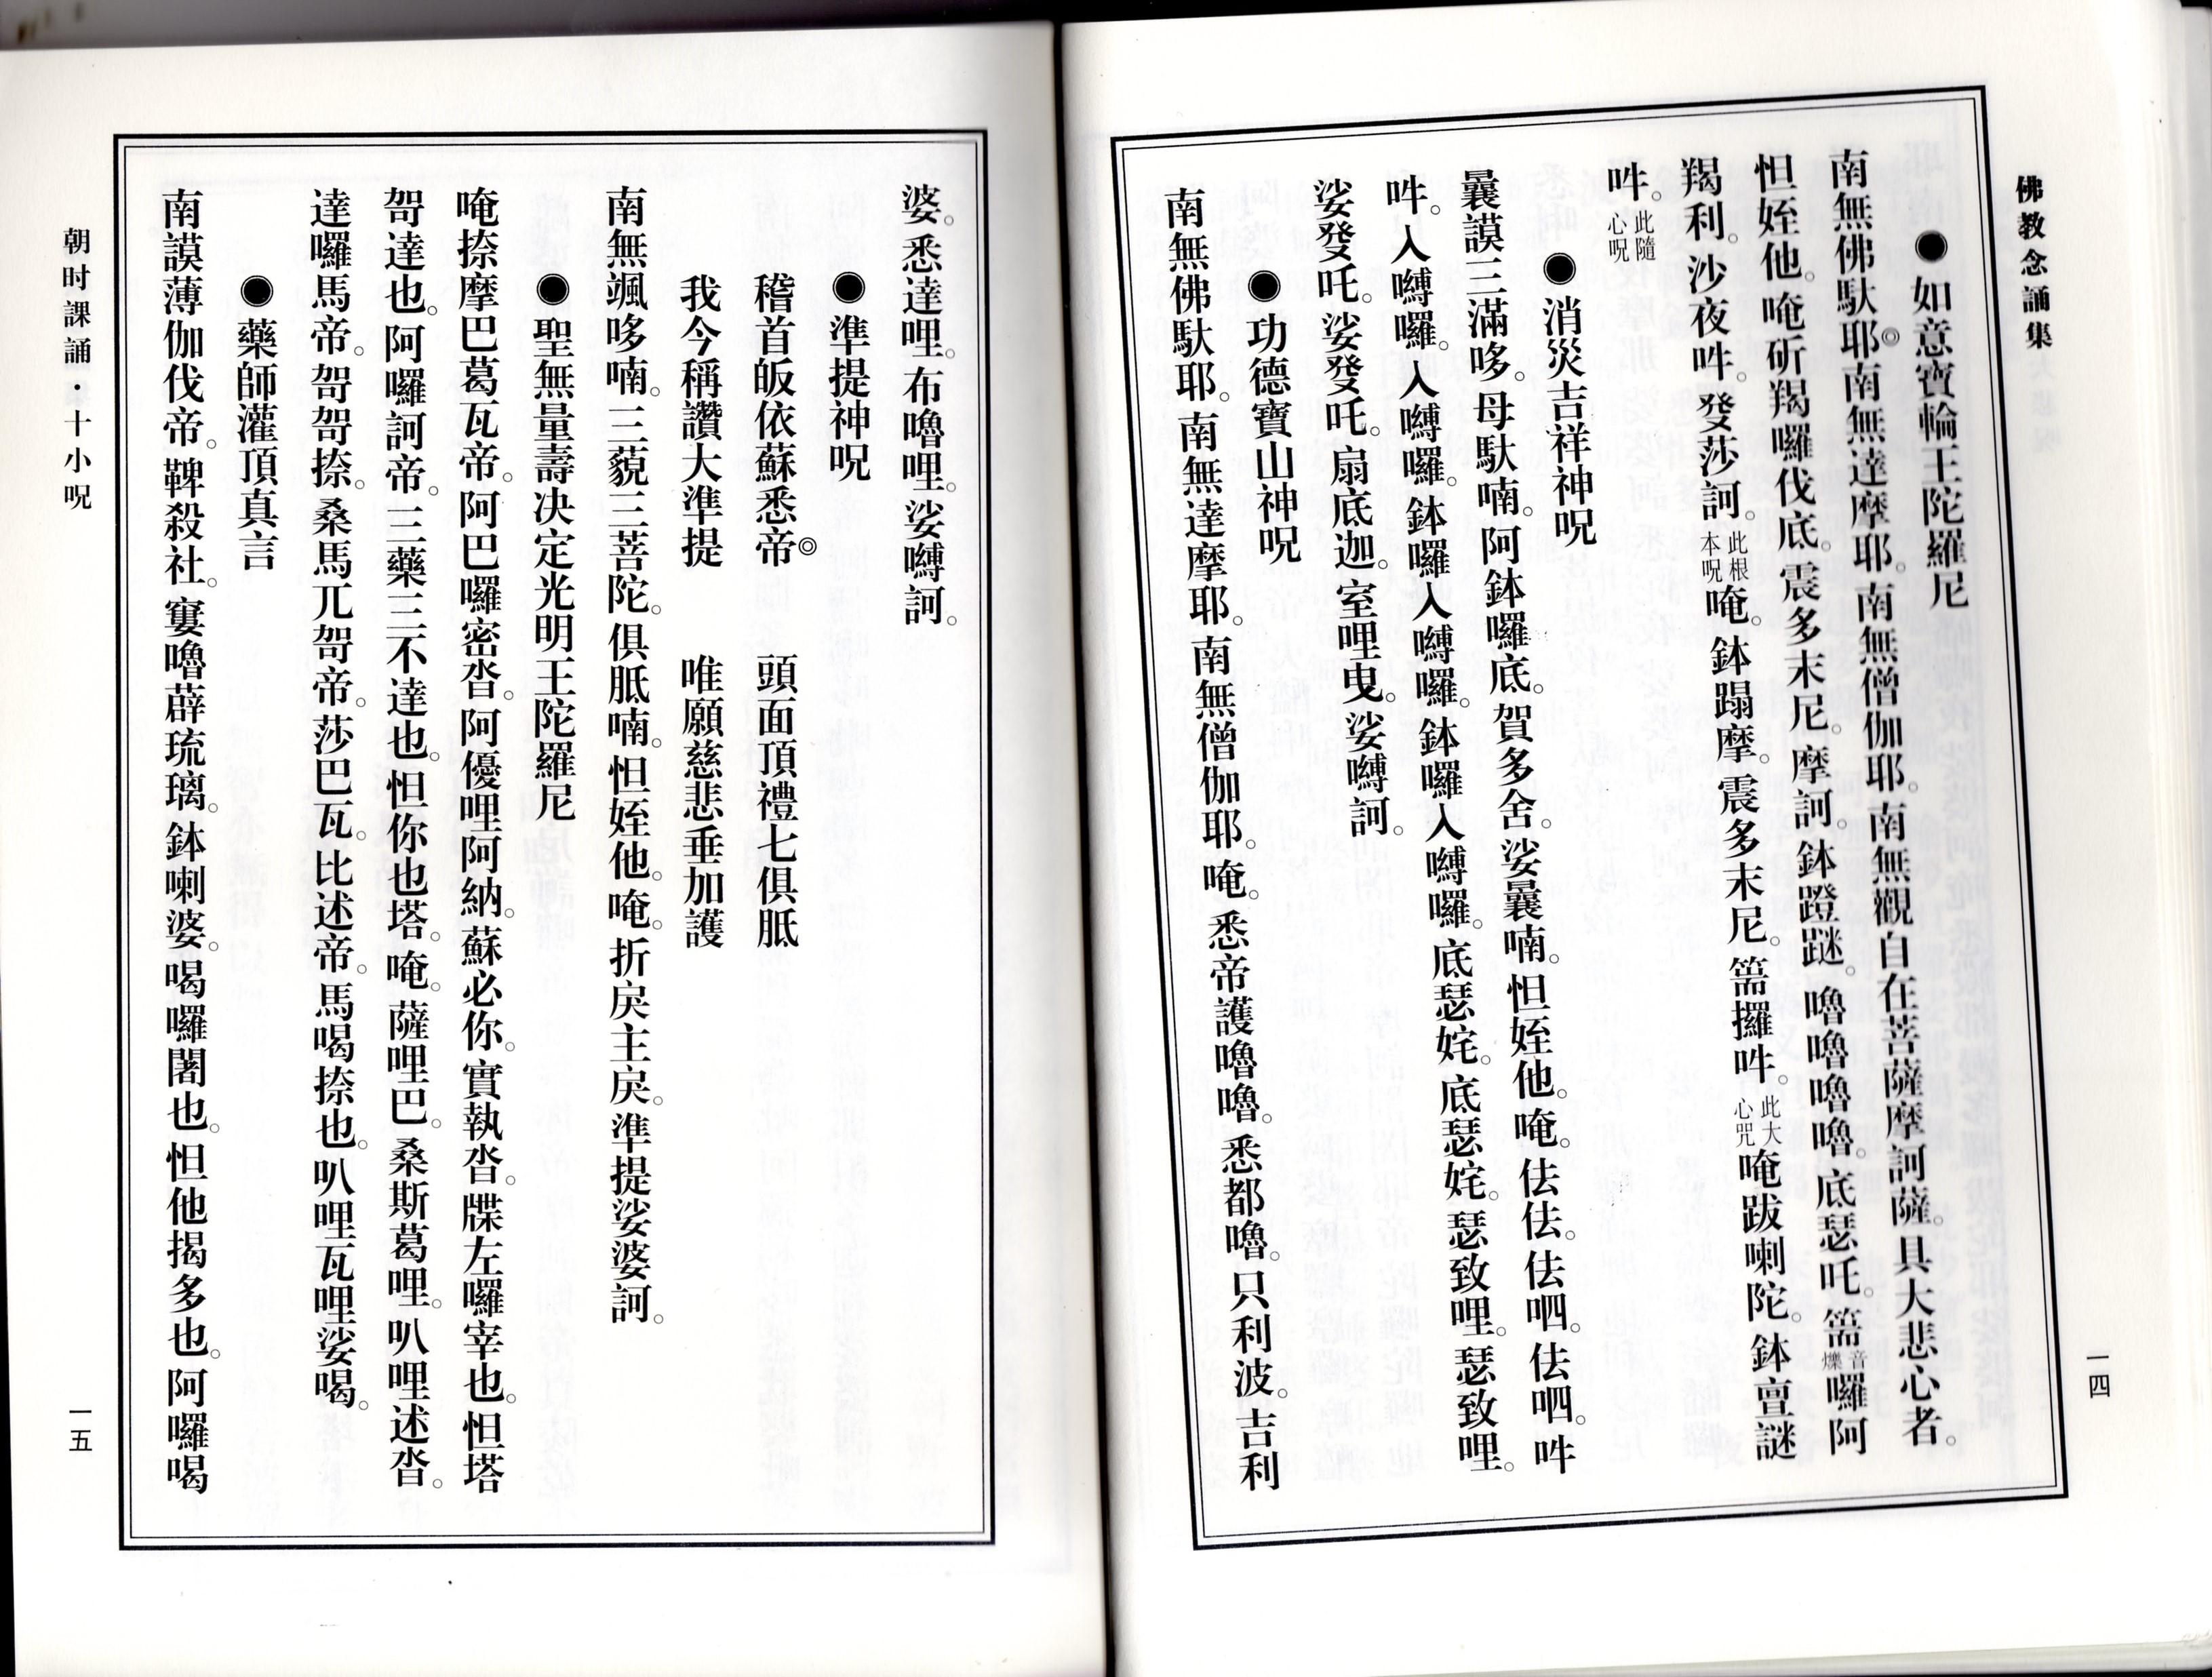 http://www.wutaishanfojiao.com/uploadfile/2014/1016/20141016072223431.jpg